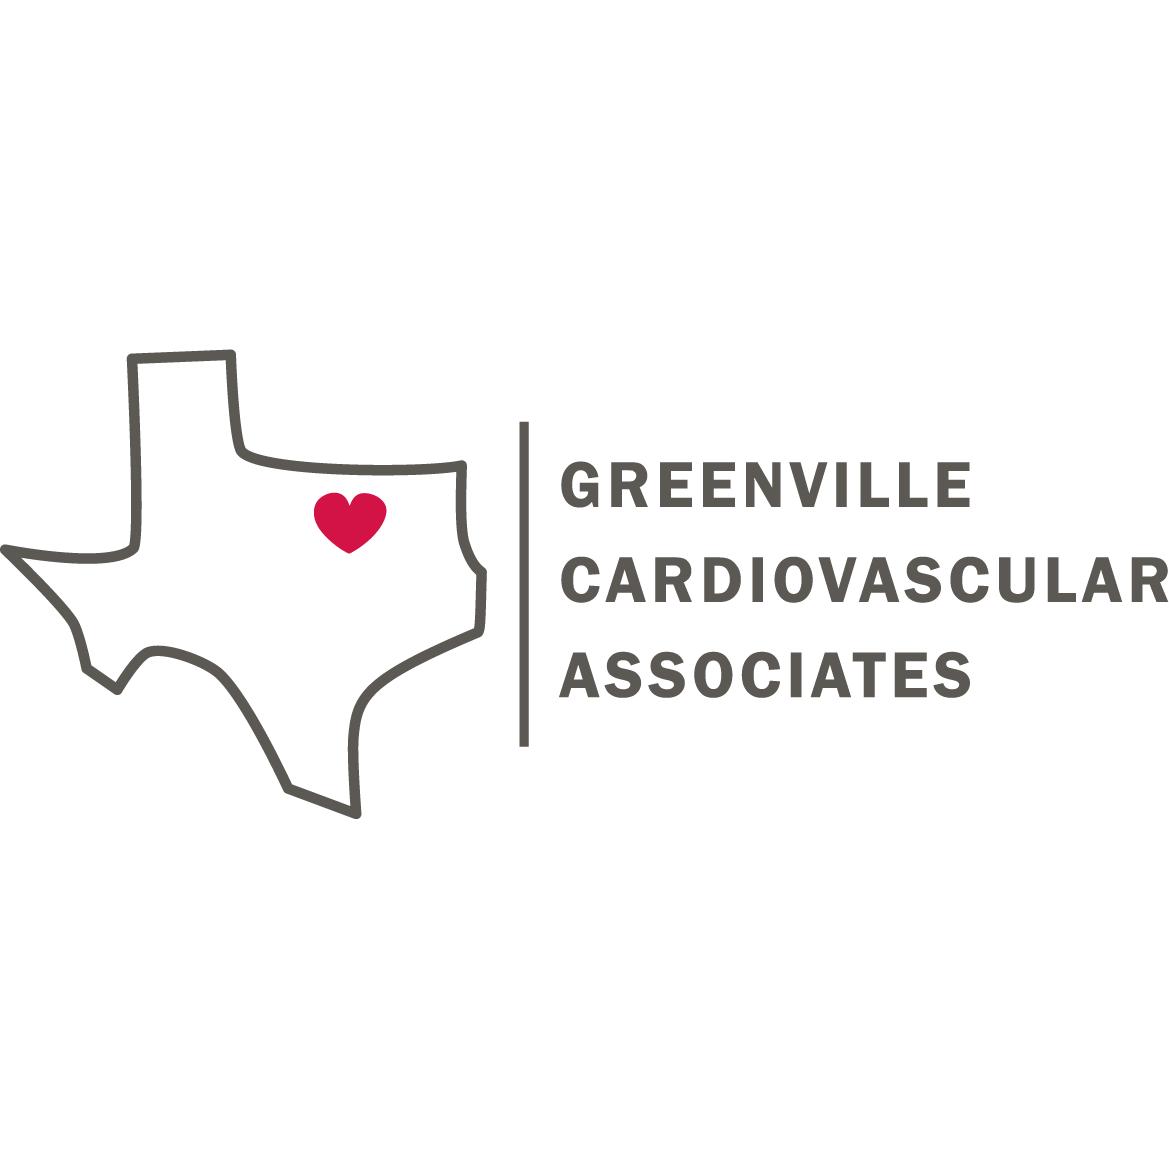 Greenville Cardiovascular Associates